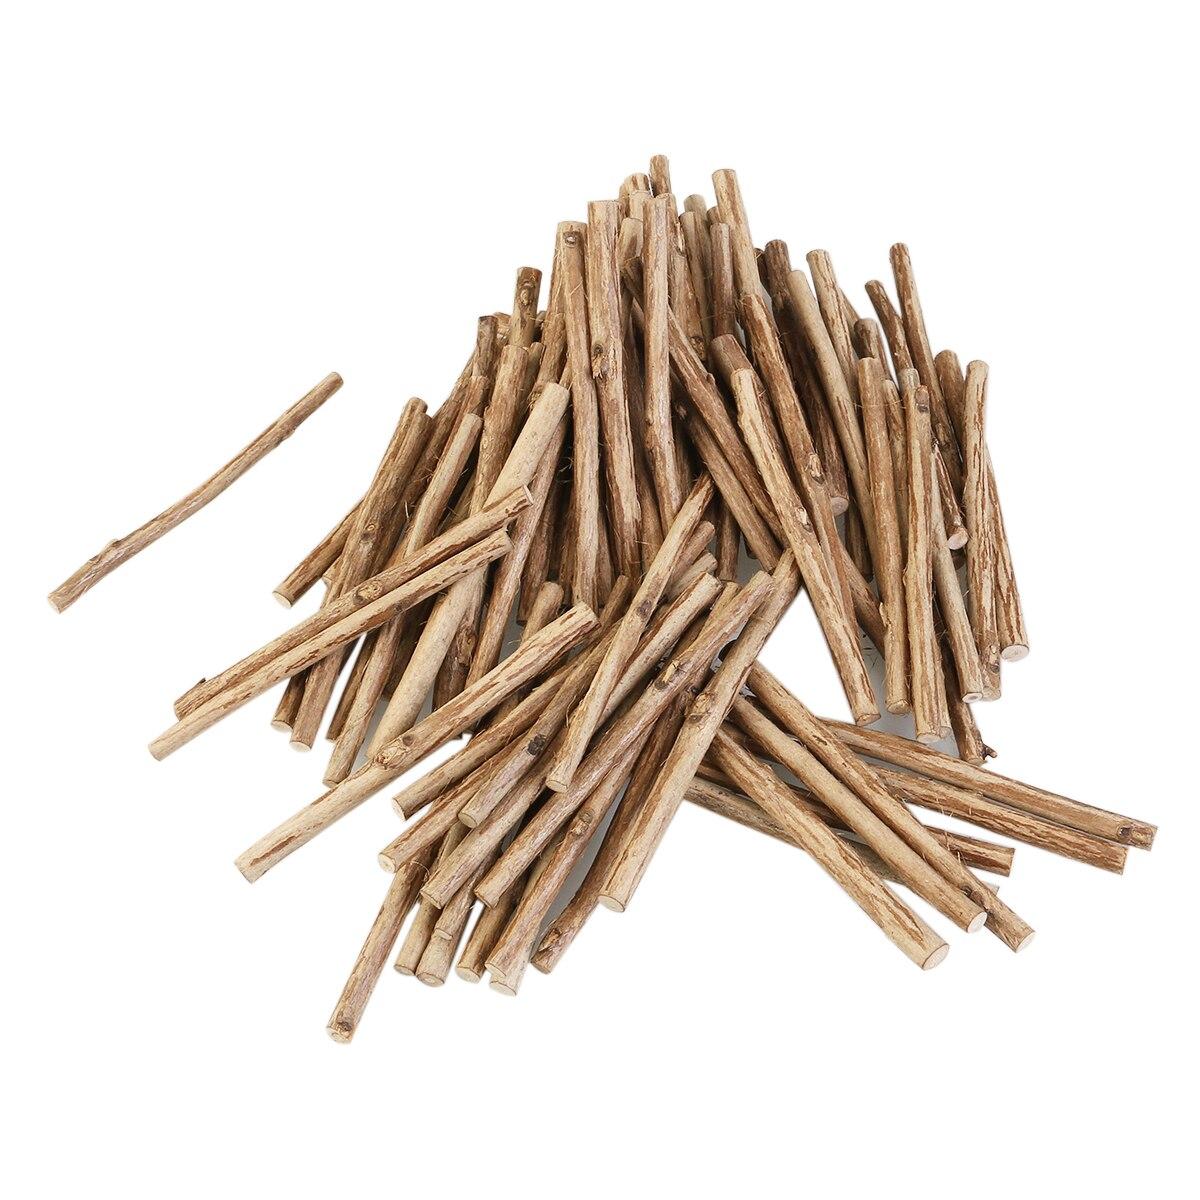 Round wooden sticks for crafts - 100pcs 10cm Long 0 5 0 8cm In Diameter Wood Log Sticks Wood Natural Color Round